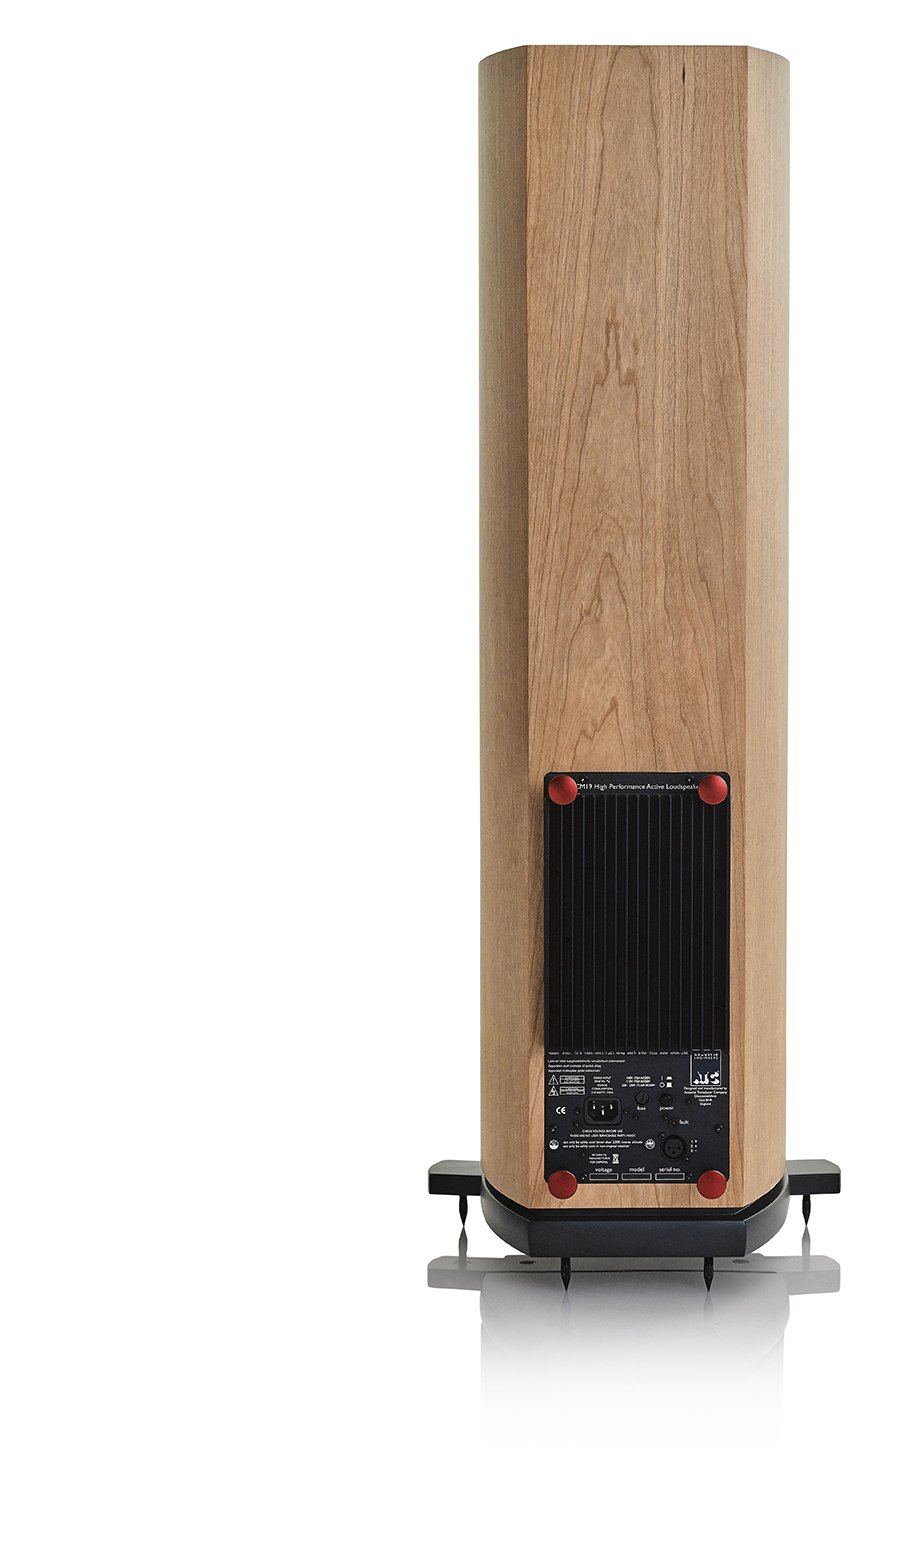 ATC_SCM19A_loudspeaker_review_1_s